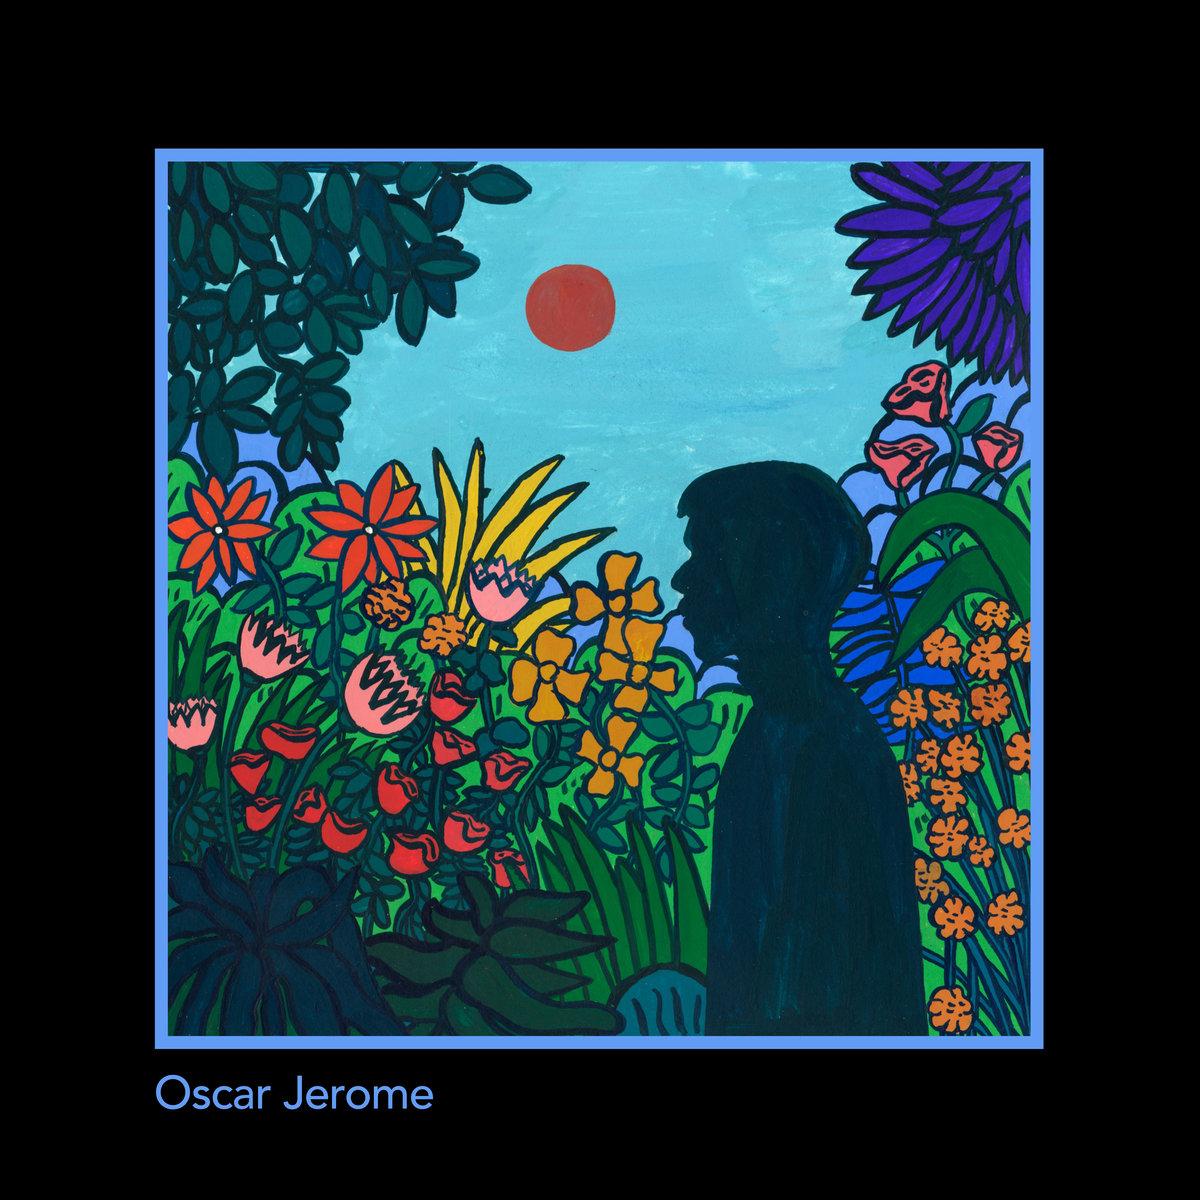 OSCAR JEROME - OSCAR JEROME EP (SELF-RELEASED, 2016)